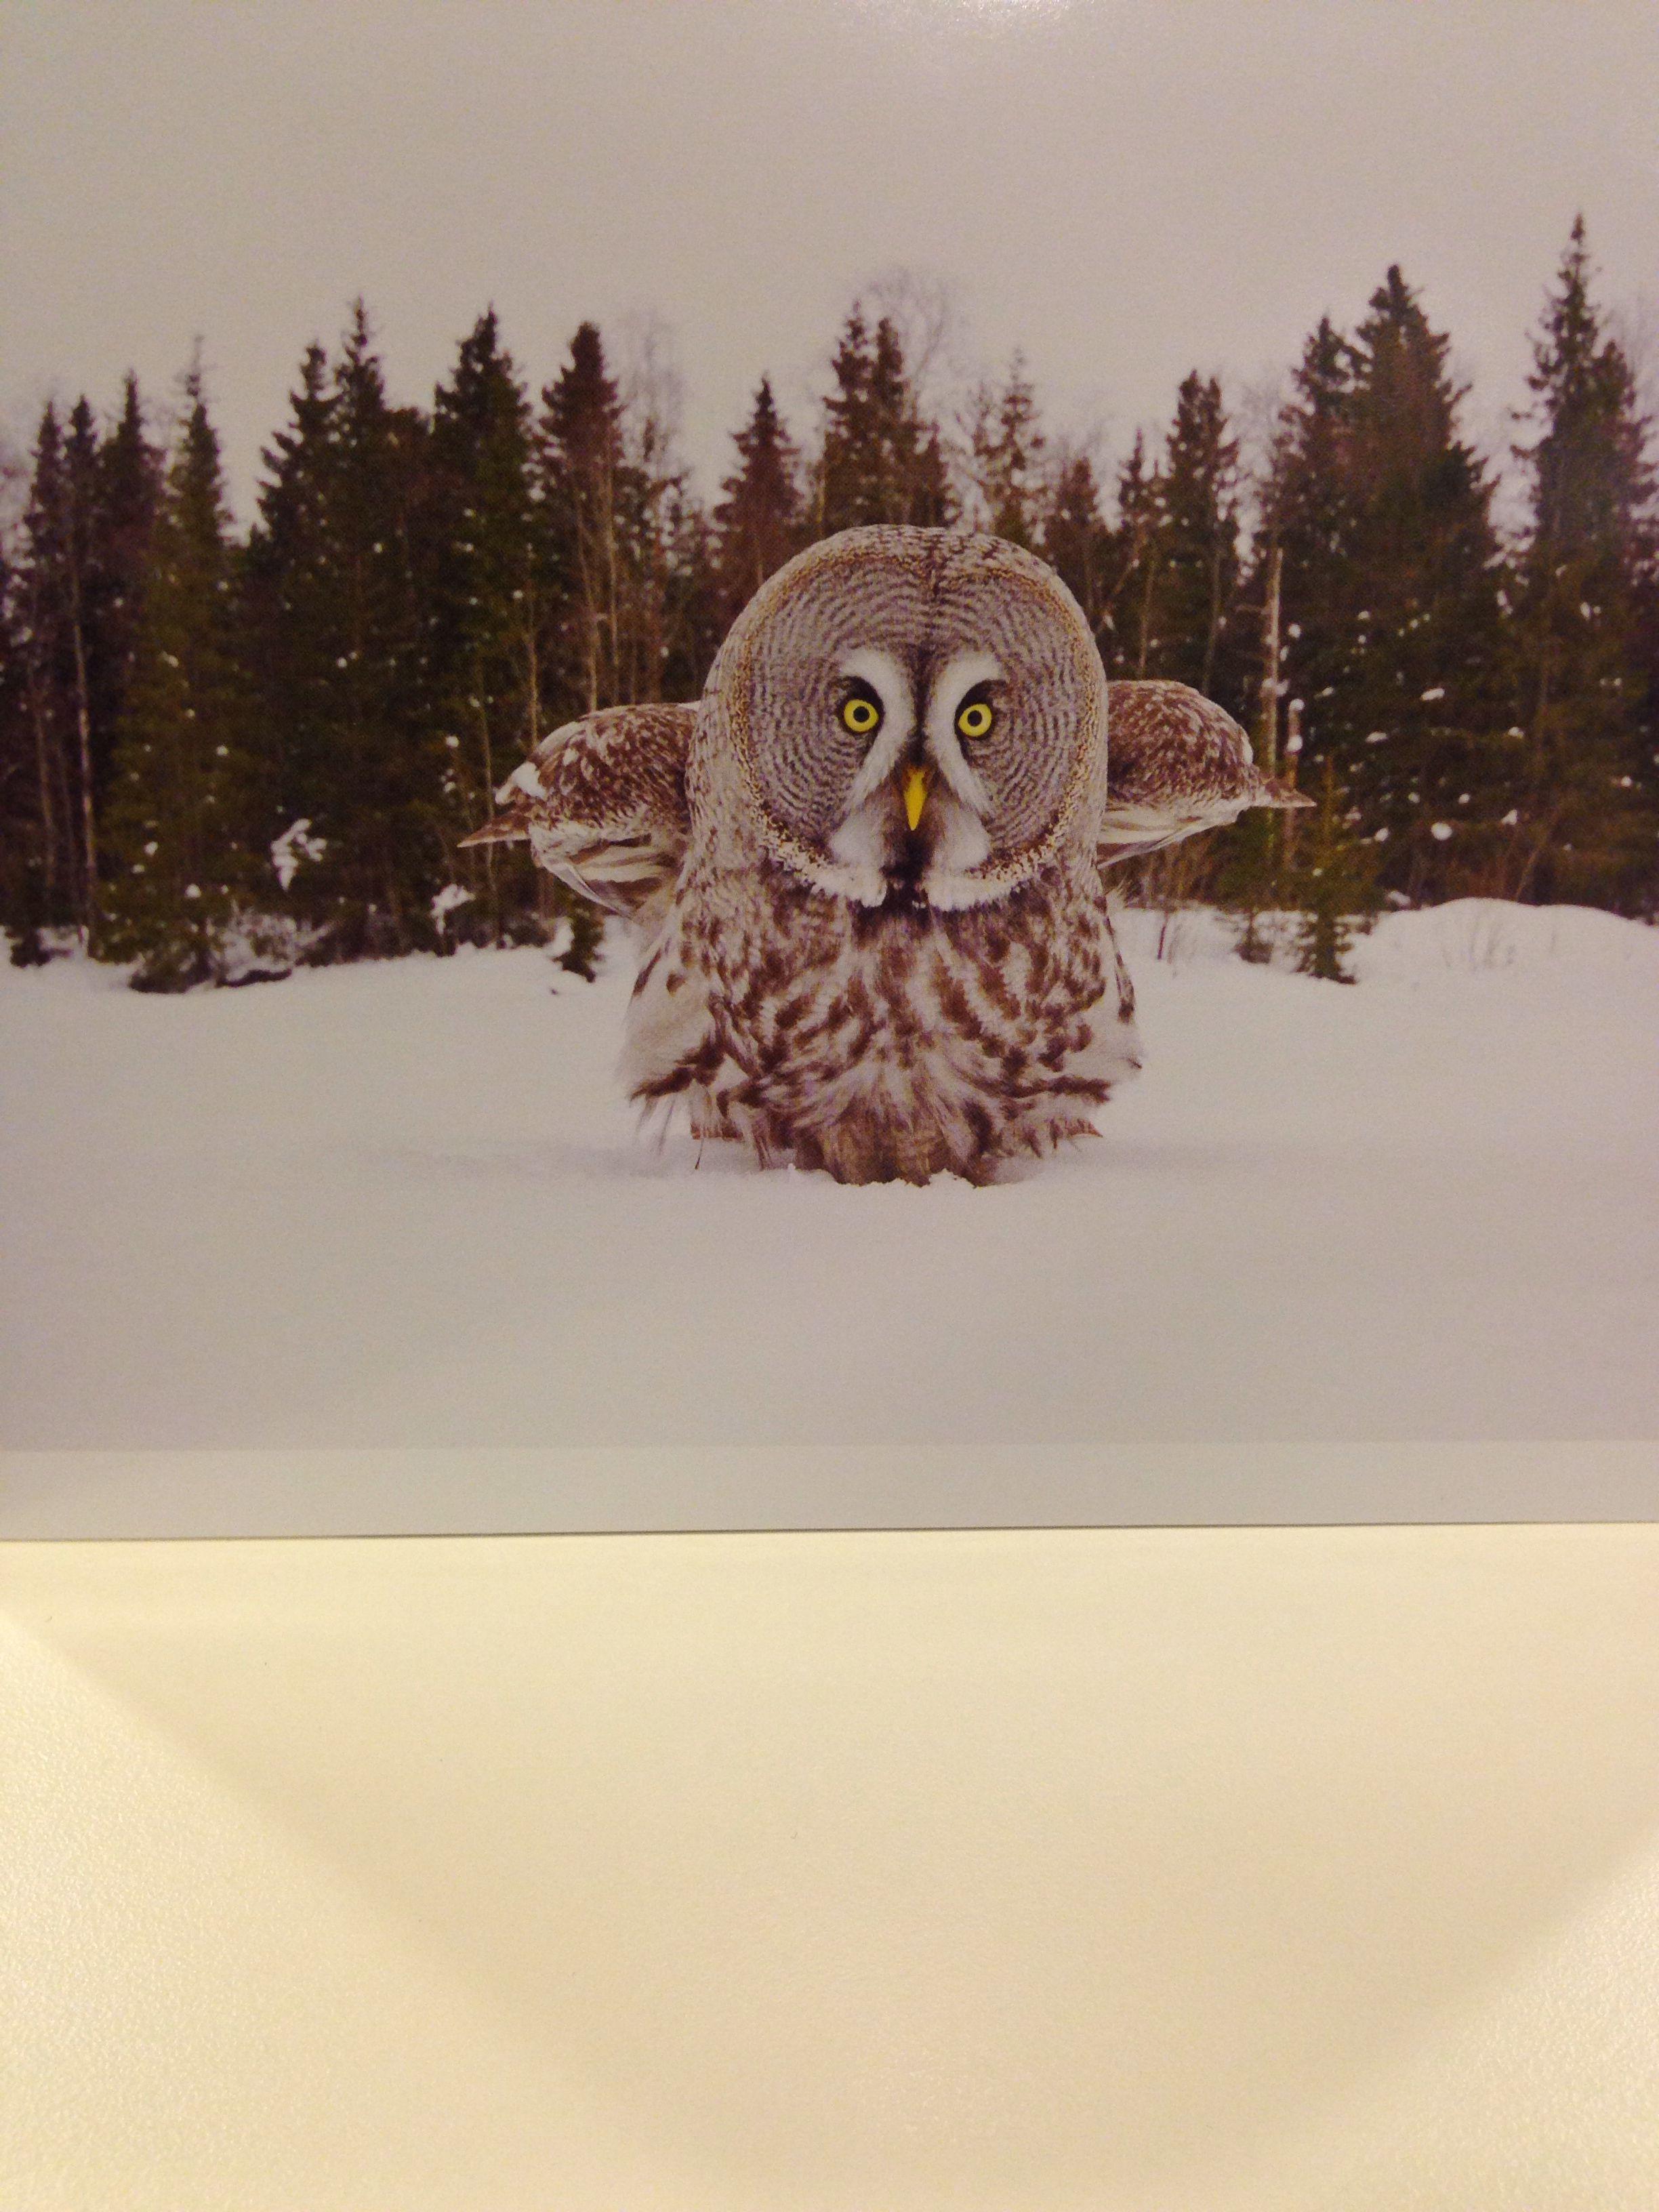 }{ Great grey owl | Great grey owl, Owl, Bird feathers